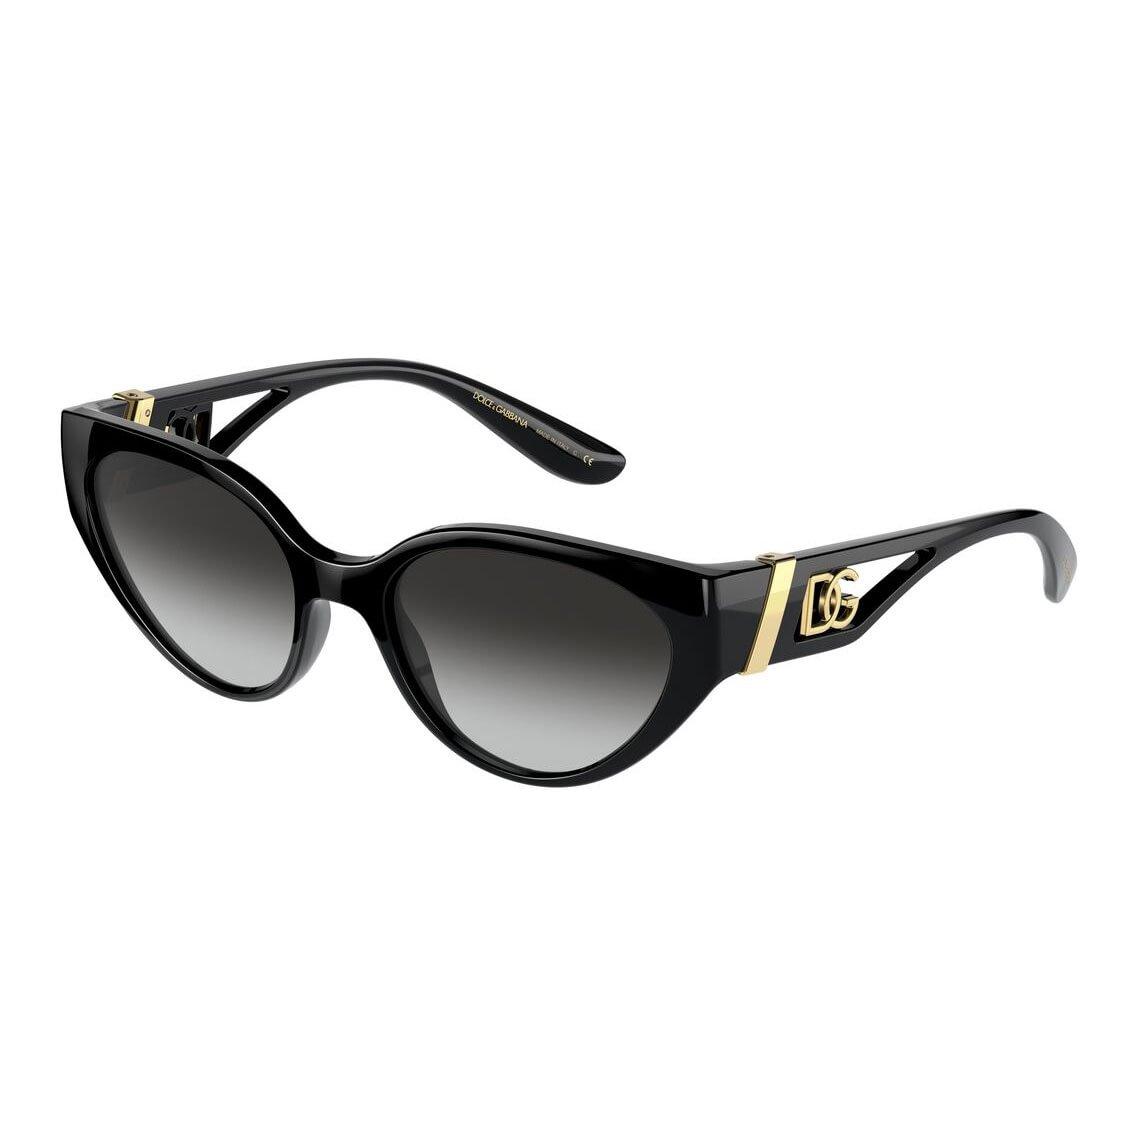 Dolce & Gabbana DG6146 501/8G 5419